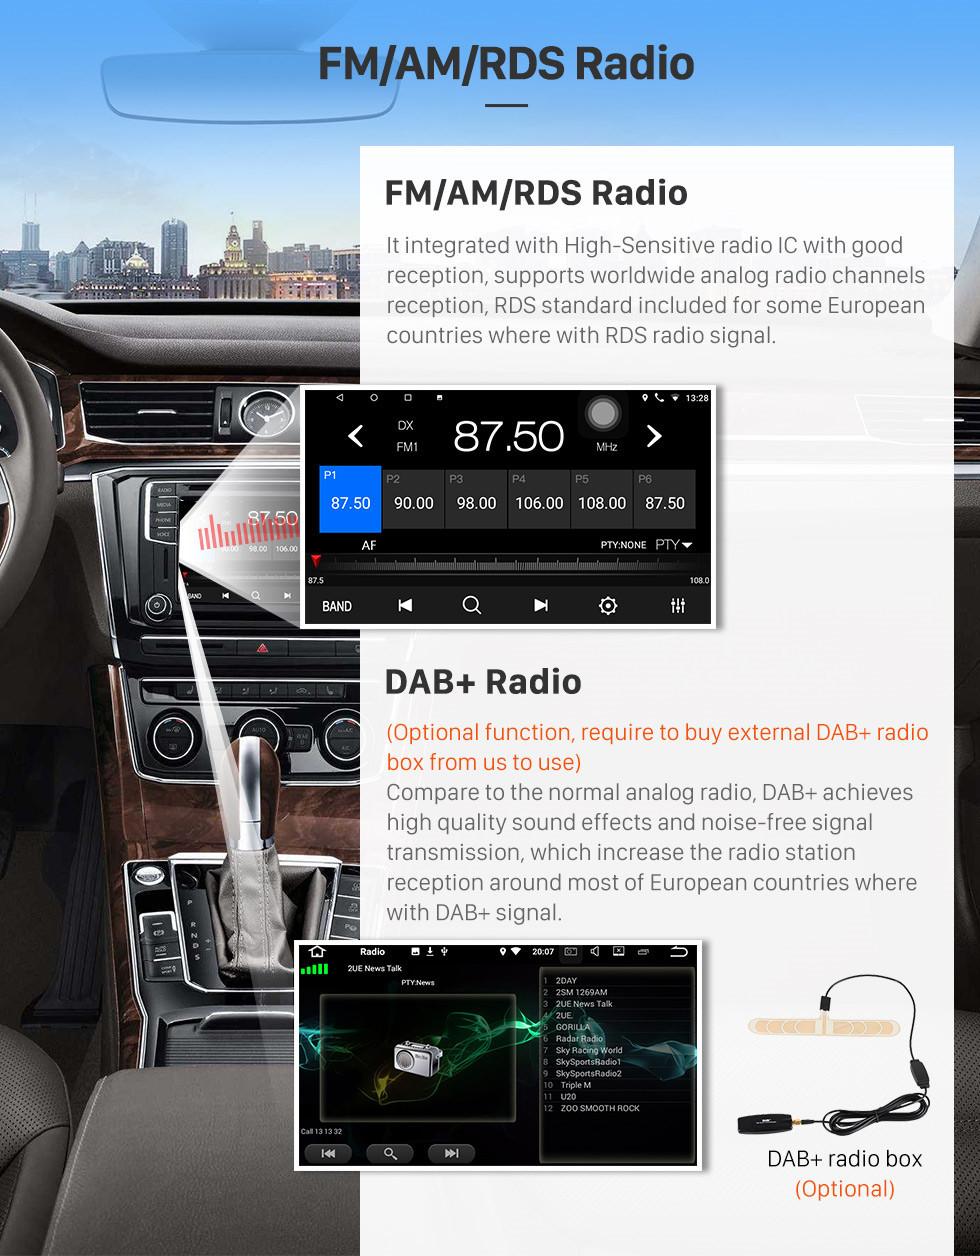 Seicane Android 10.0 GPS Radio 10.1 Inch HD Touchscreen Head Unit For 2010 2011 2012 2013 2014 2015 Mitsubishi ASX Peugeot 4008 Bluetooth Música WIFI Suporte Câmera Retrovisor Câmera Controle de volante